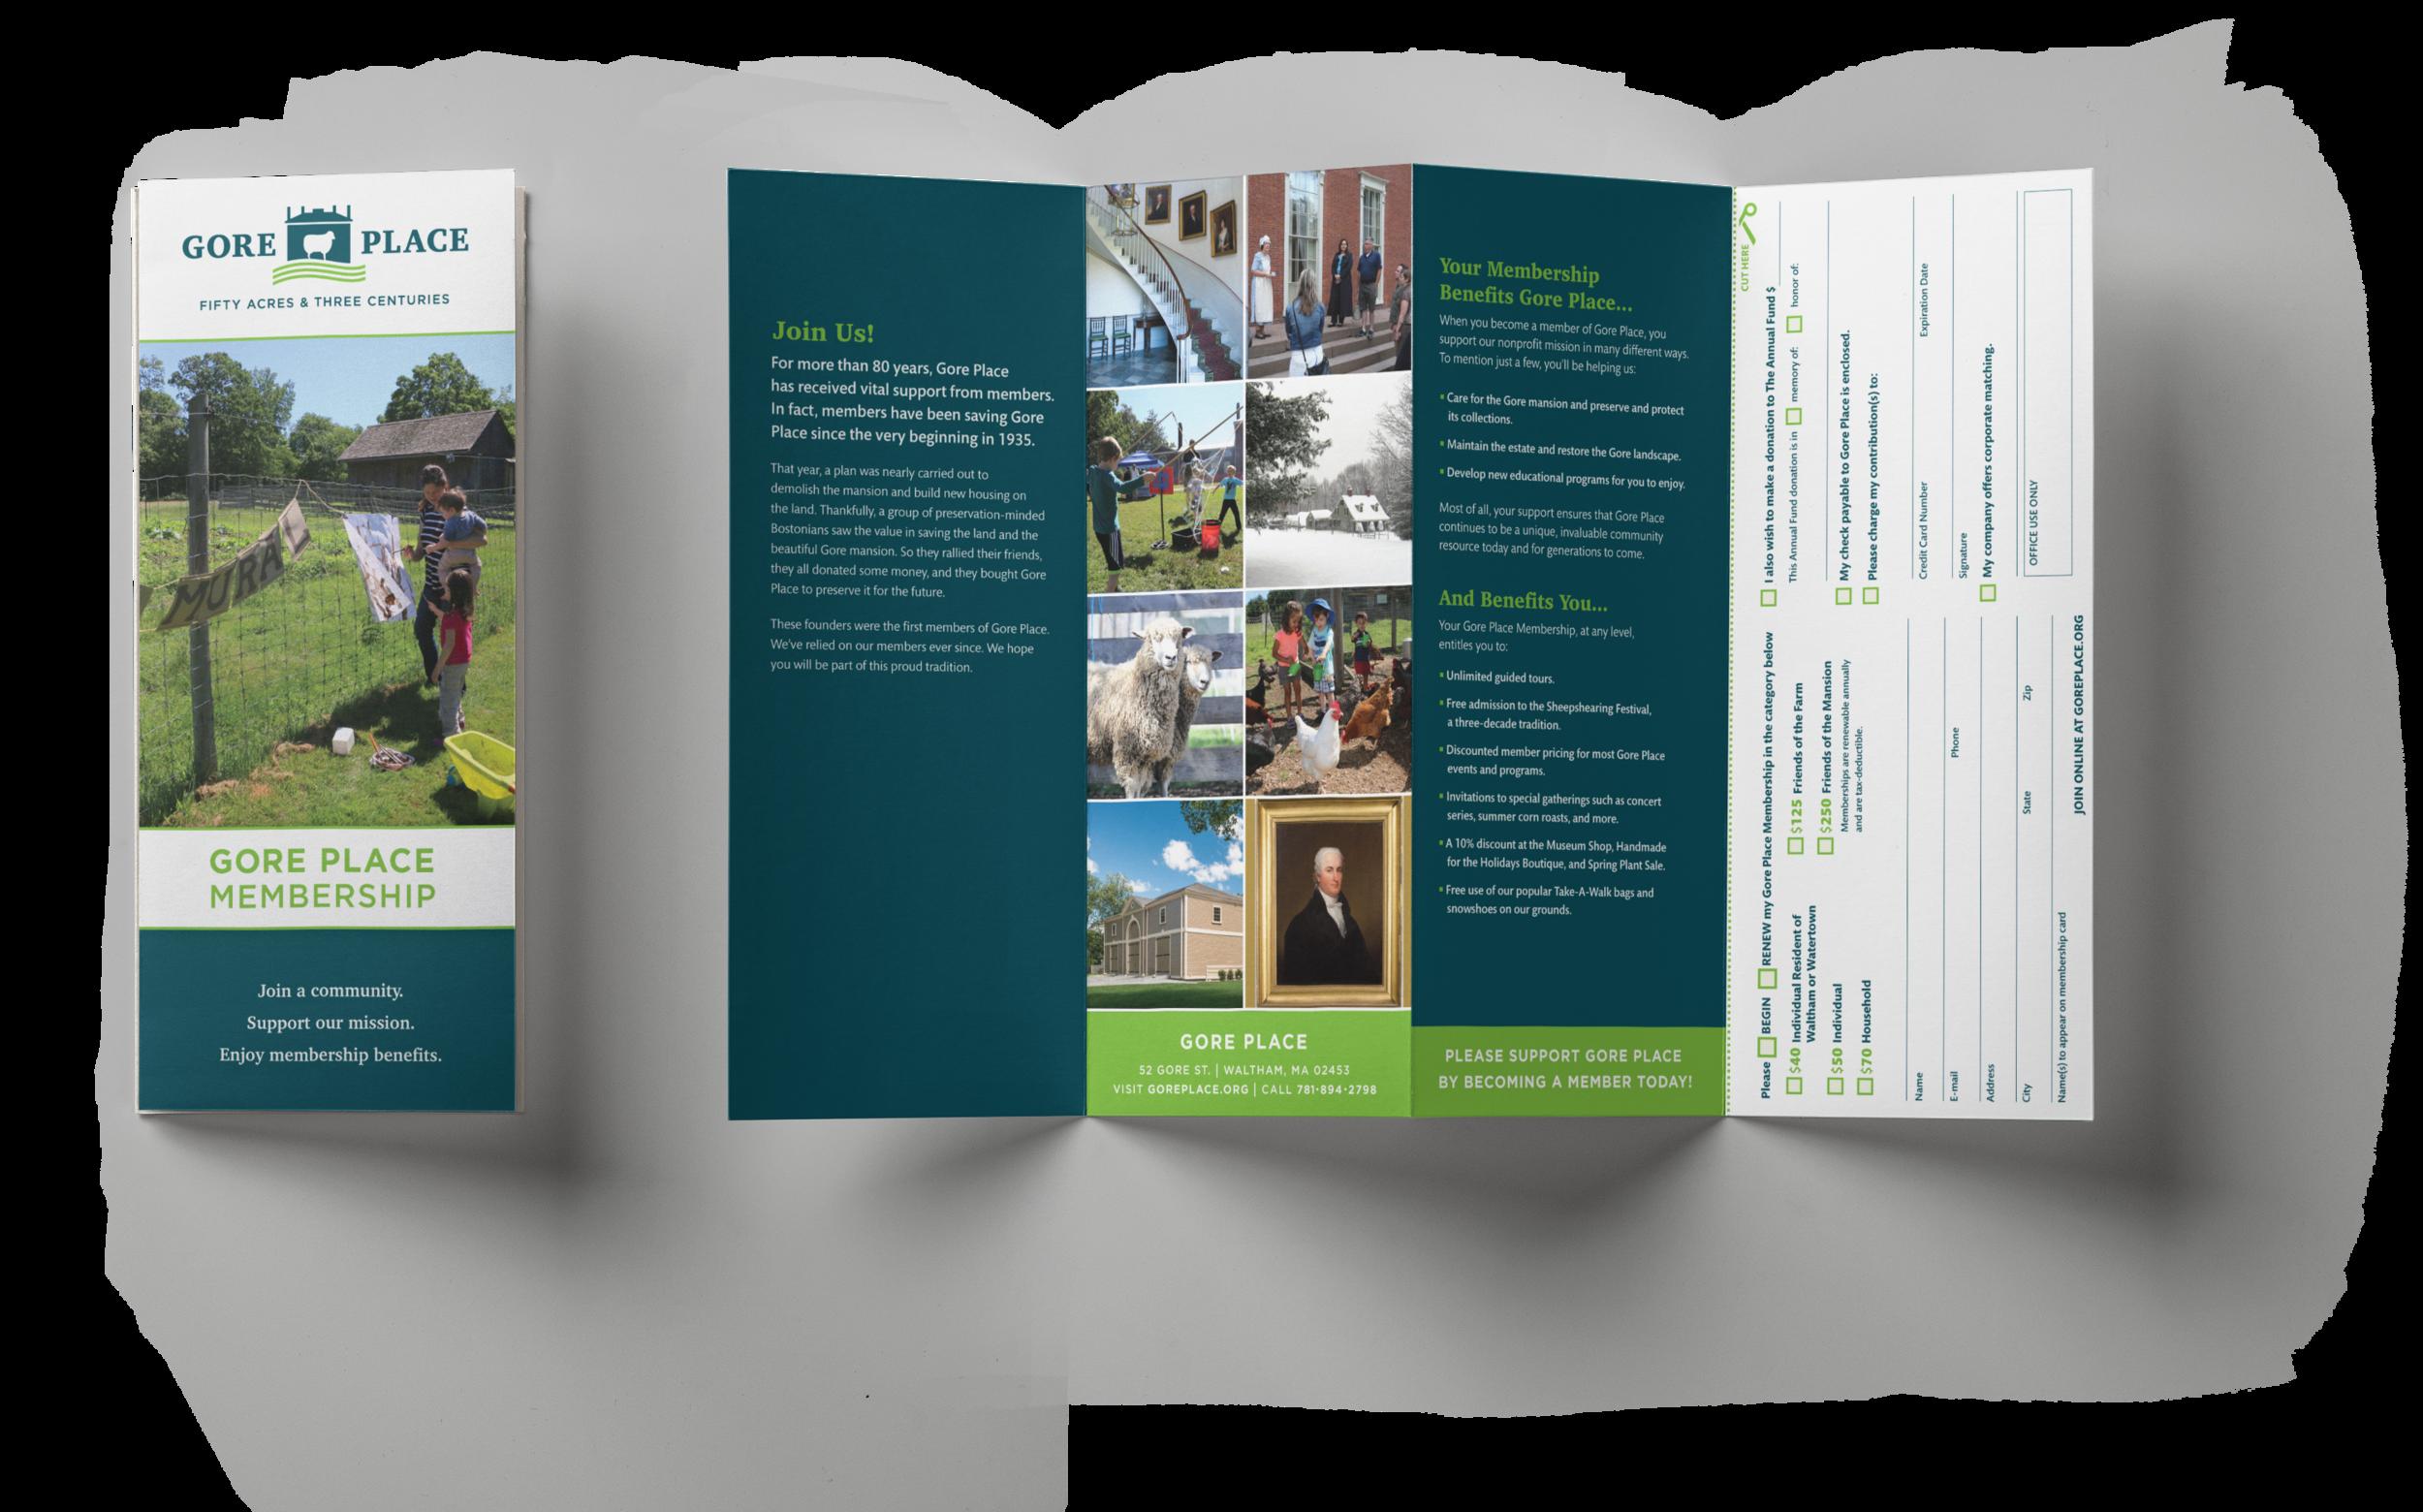 gp_brochure (1).png